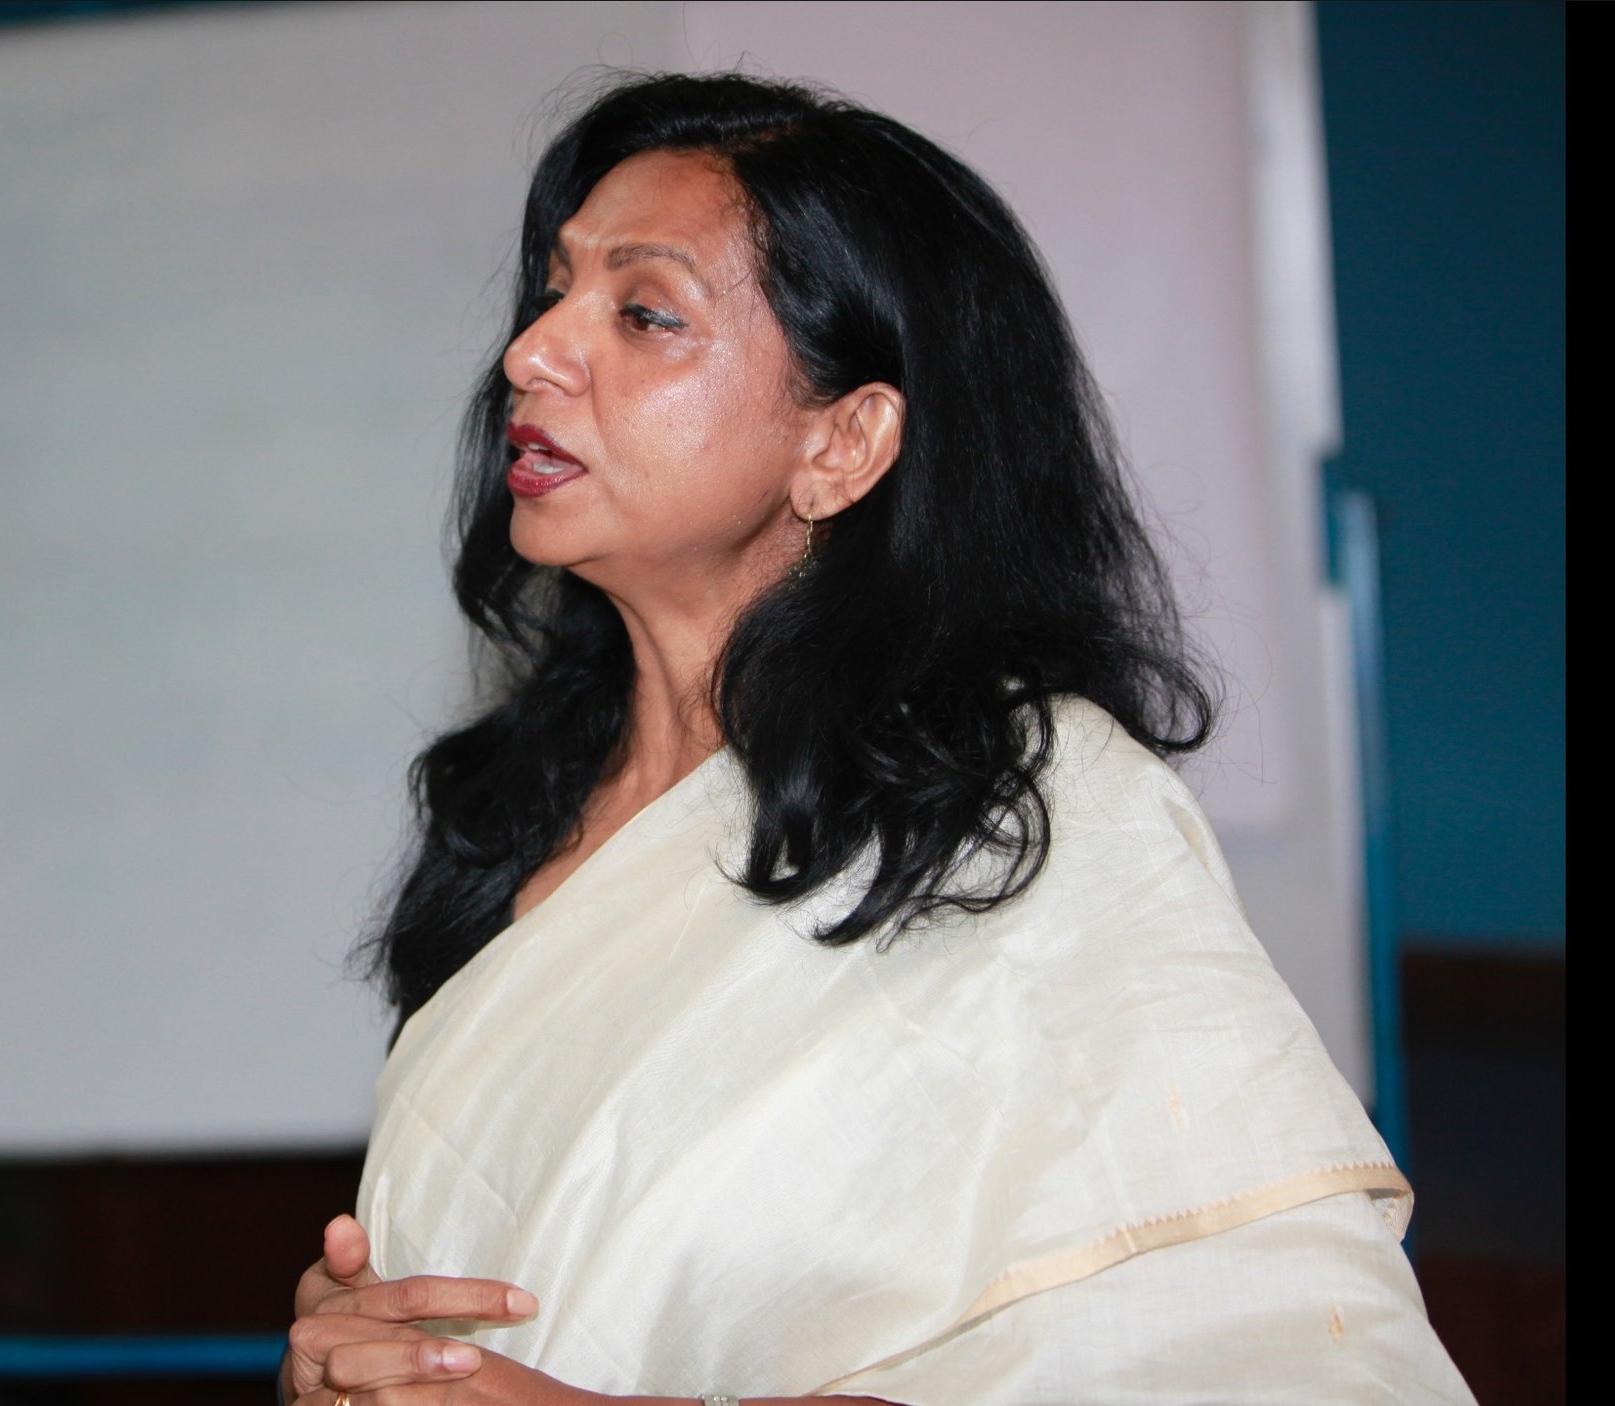 OMNIA Leader Soraya Deen addressing the importance of building power among women at Kandy Gathering